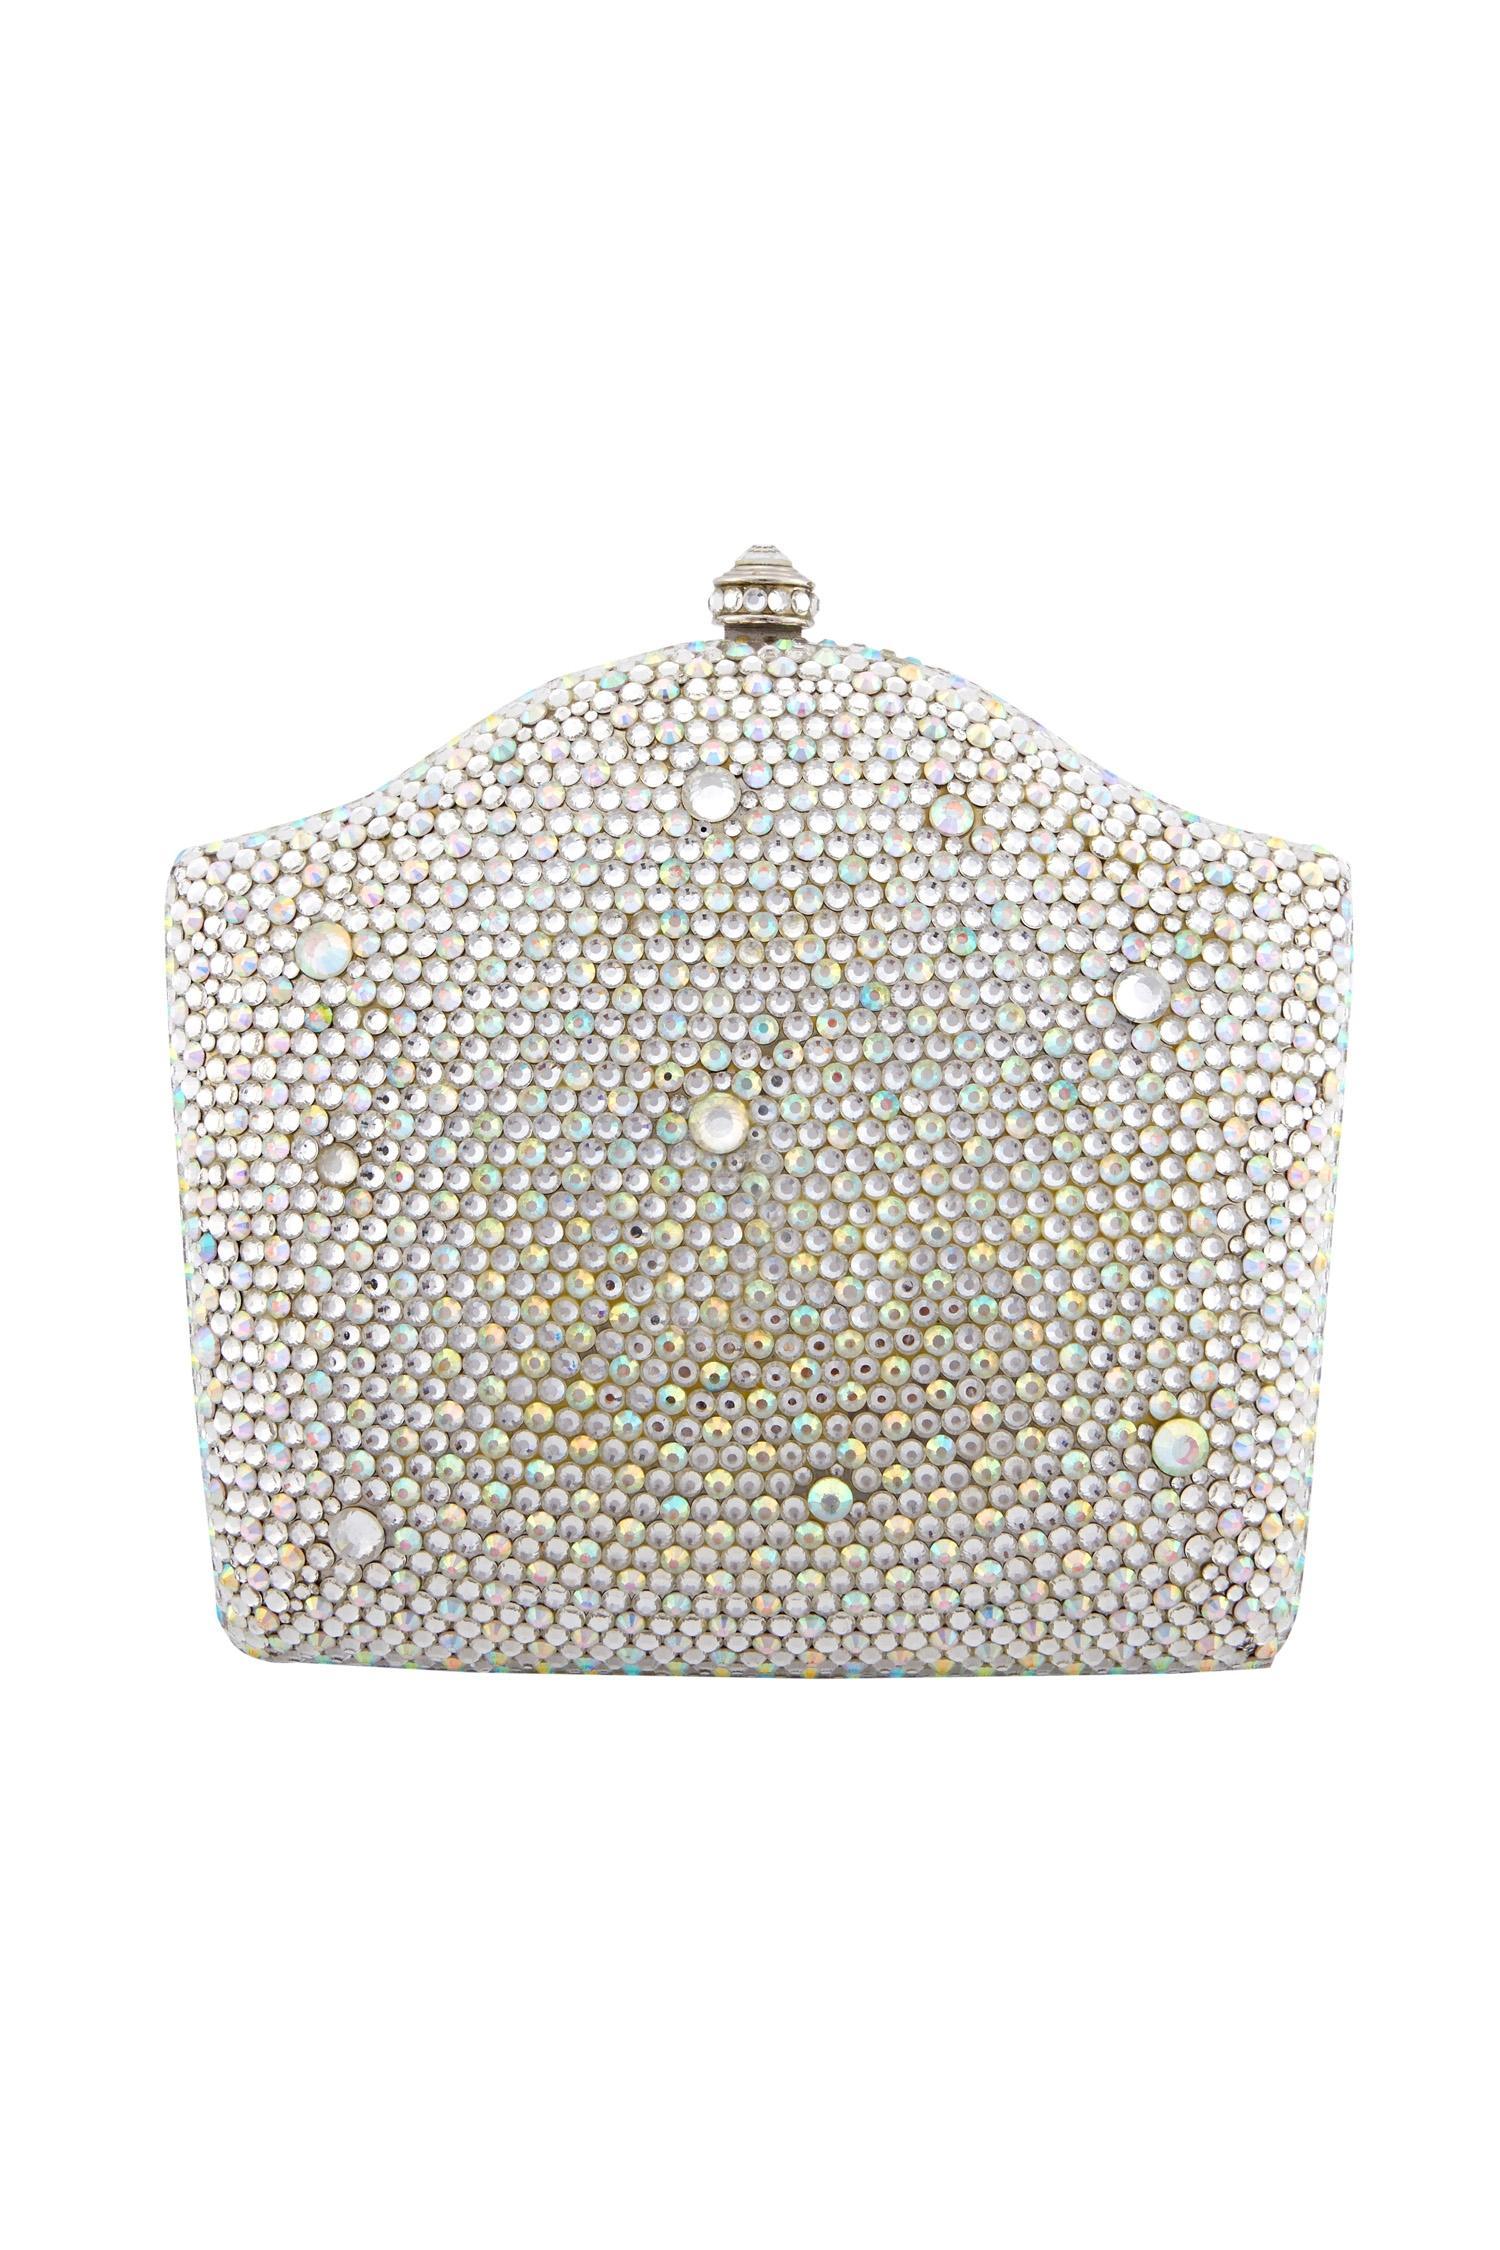 Crystal CraftWhite studded box clutch